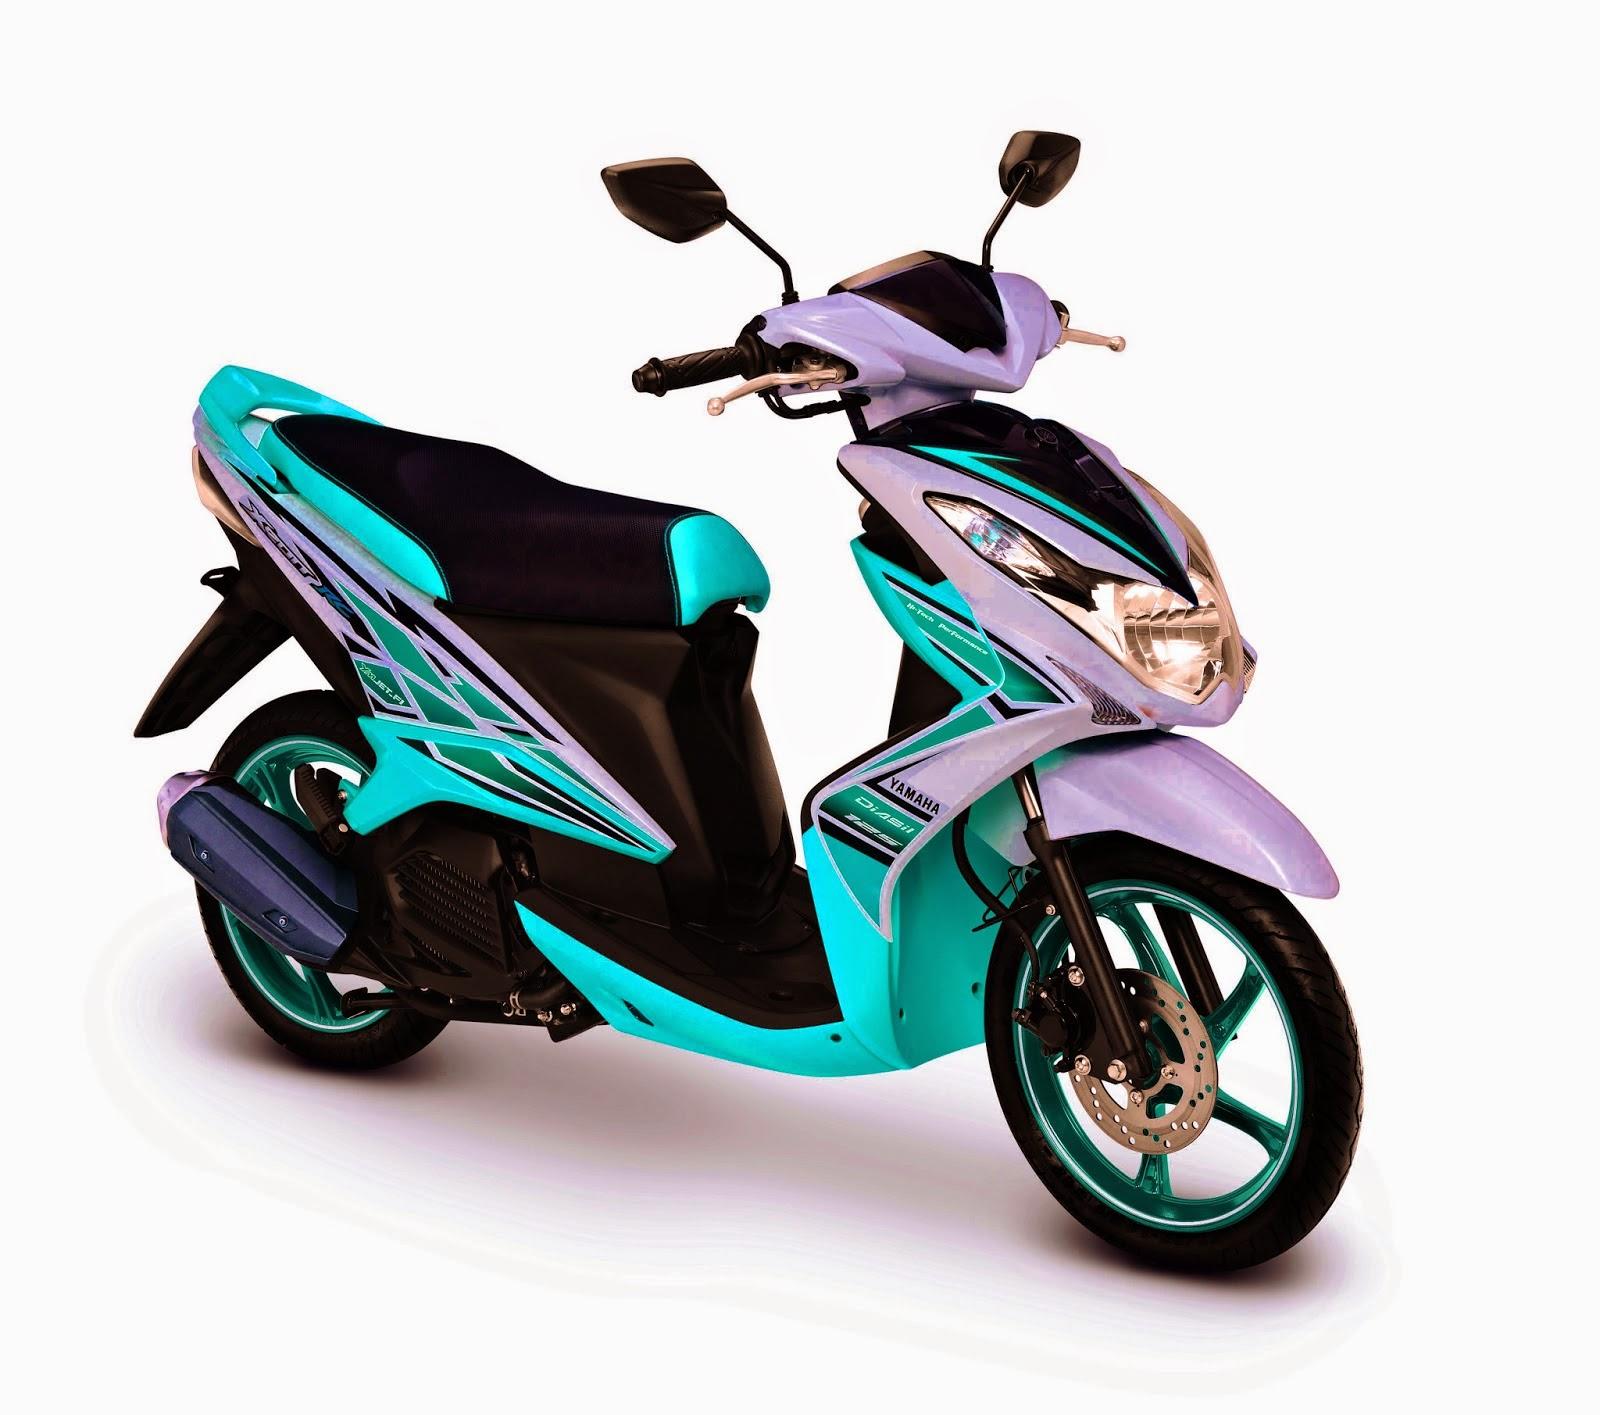 Koleksi 98 Modifikasi Motor Matic Suzuki Nex Terkeren Dinding Motor